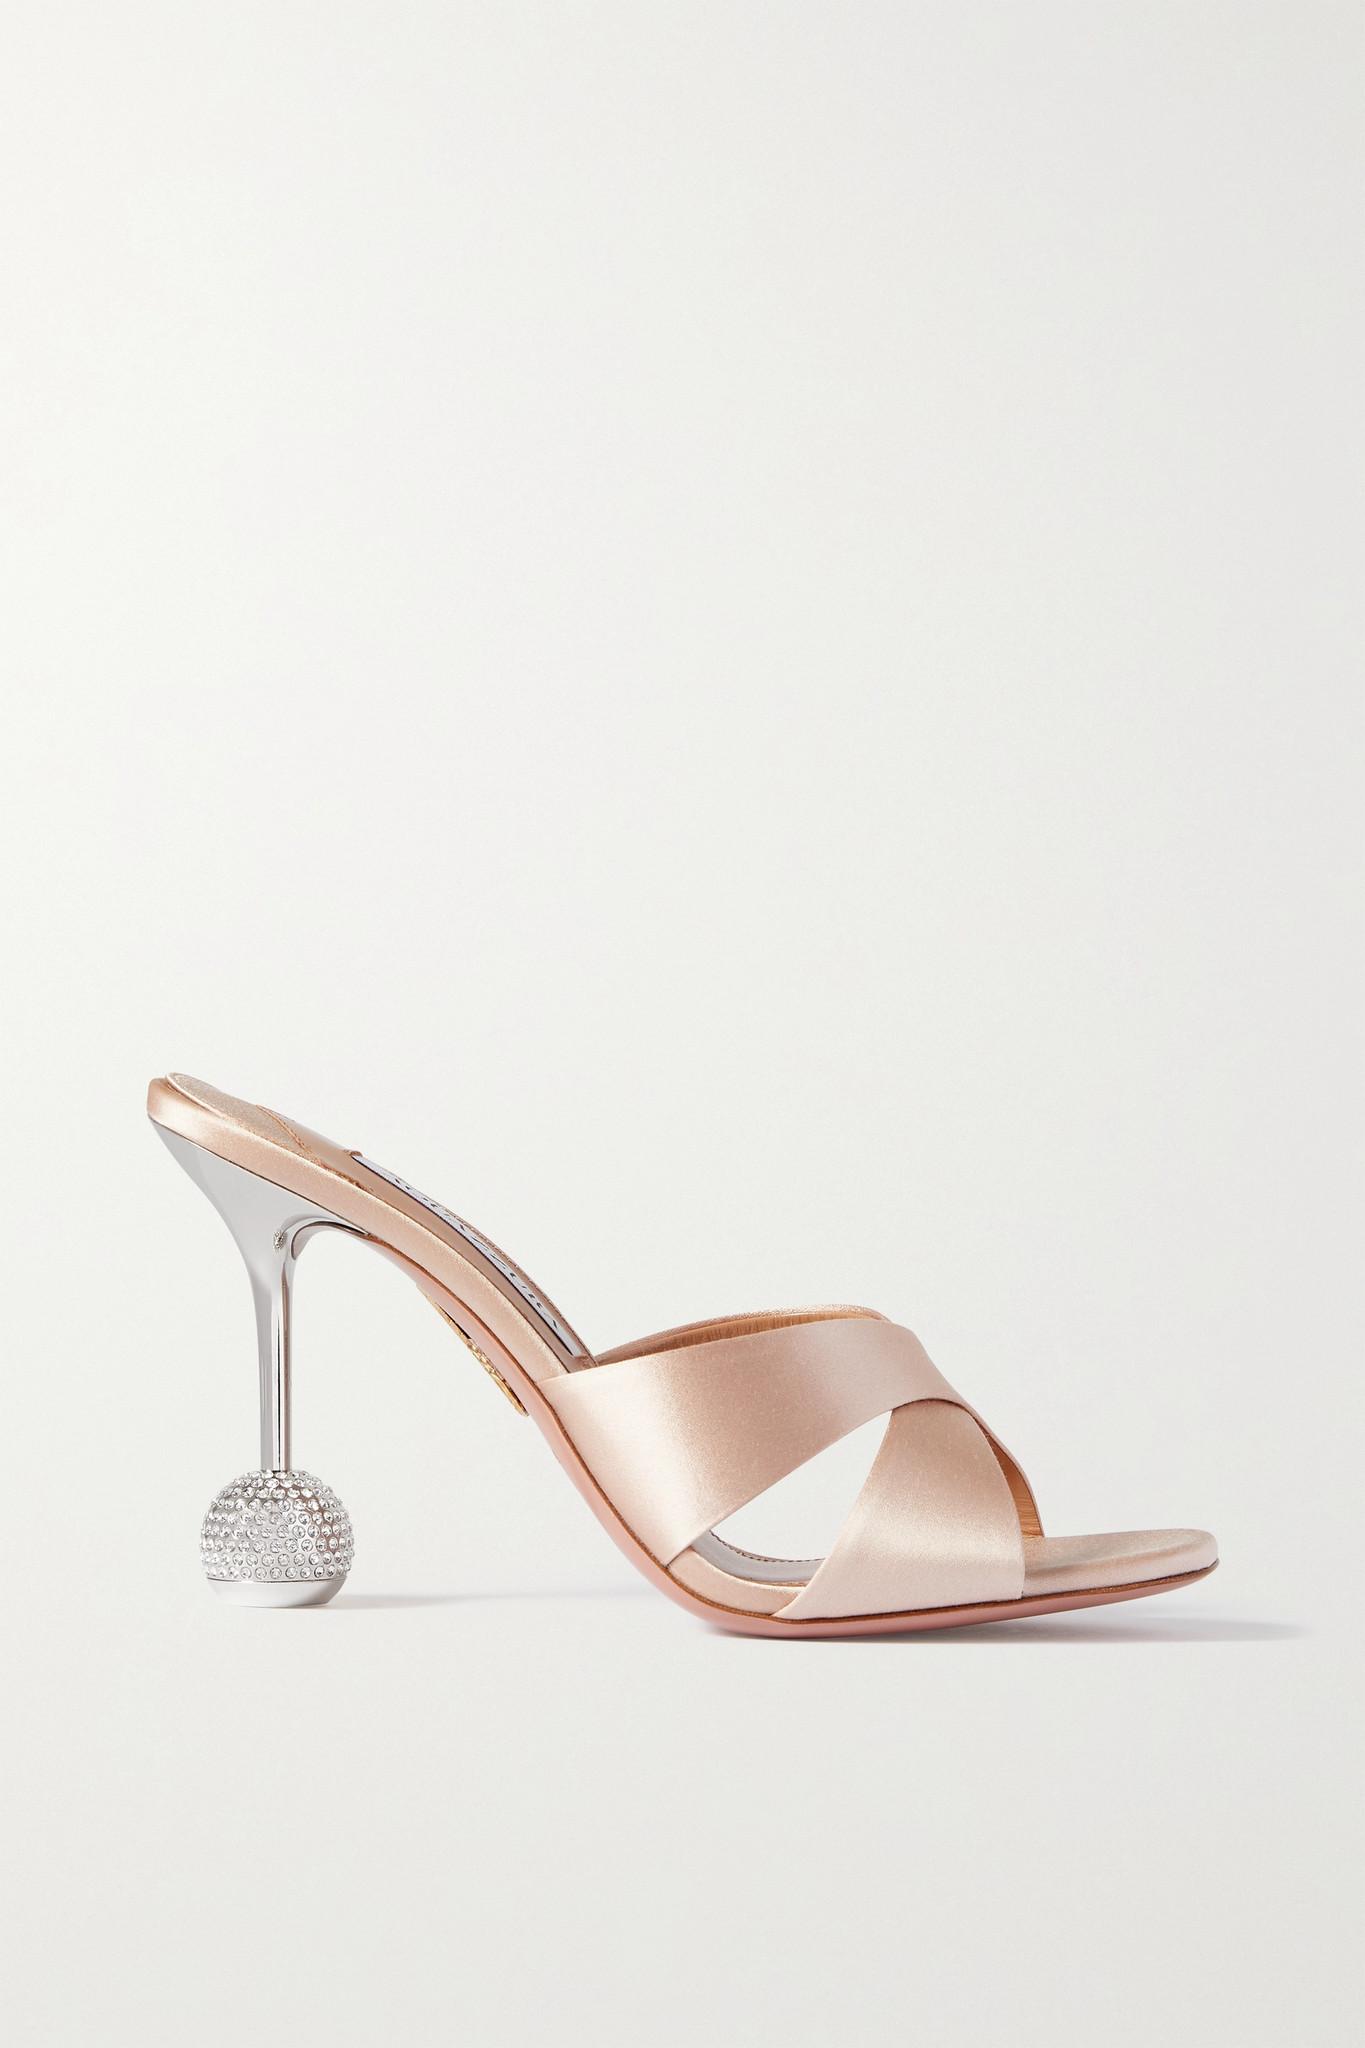 AQUAZZURA - Yes Darling 95 Crystal-embellished Satin Mules - Pink - IT38